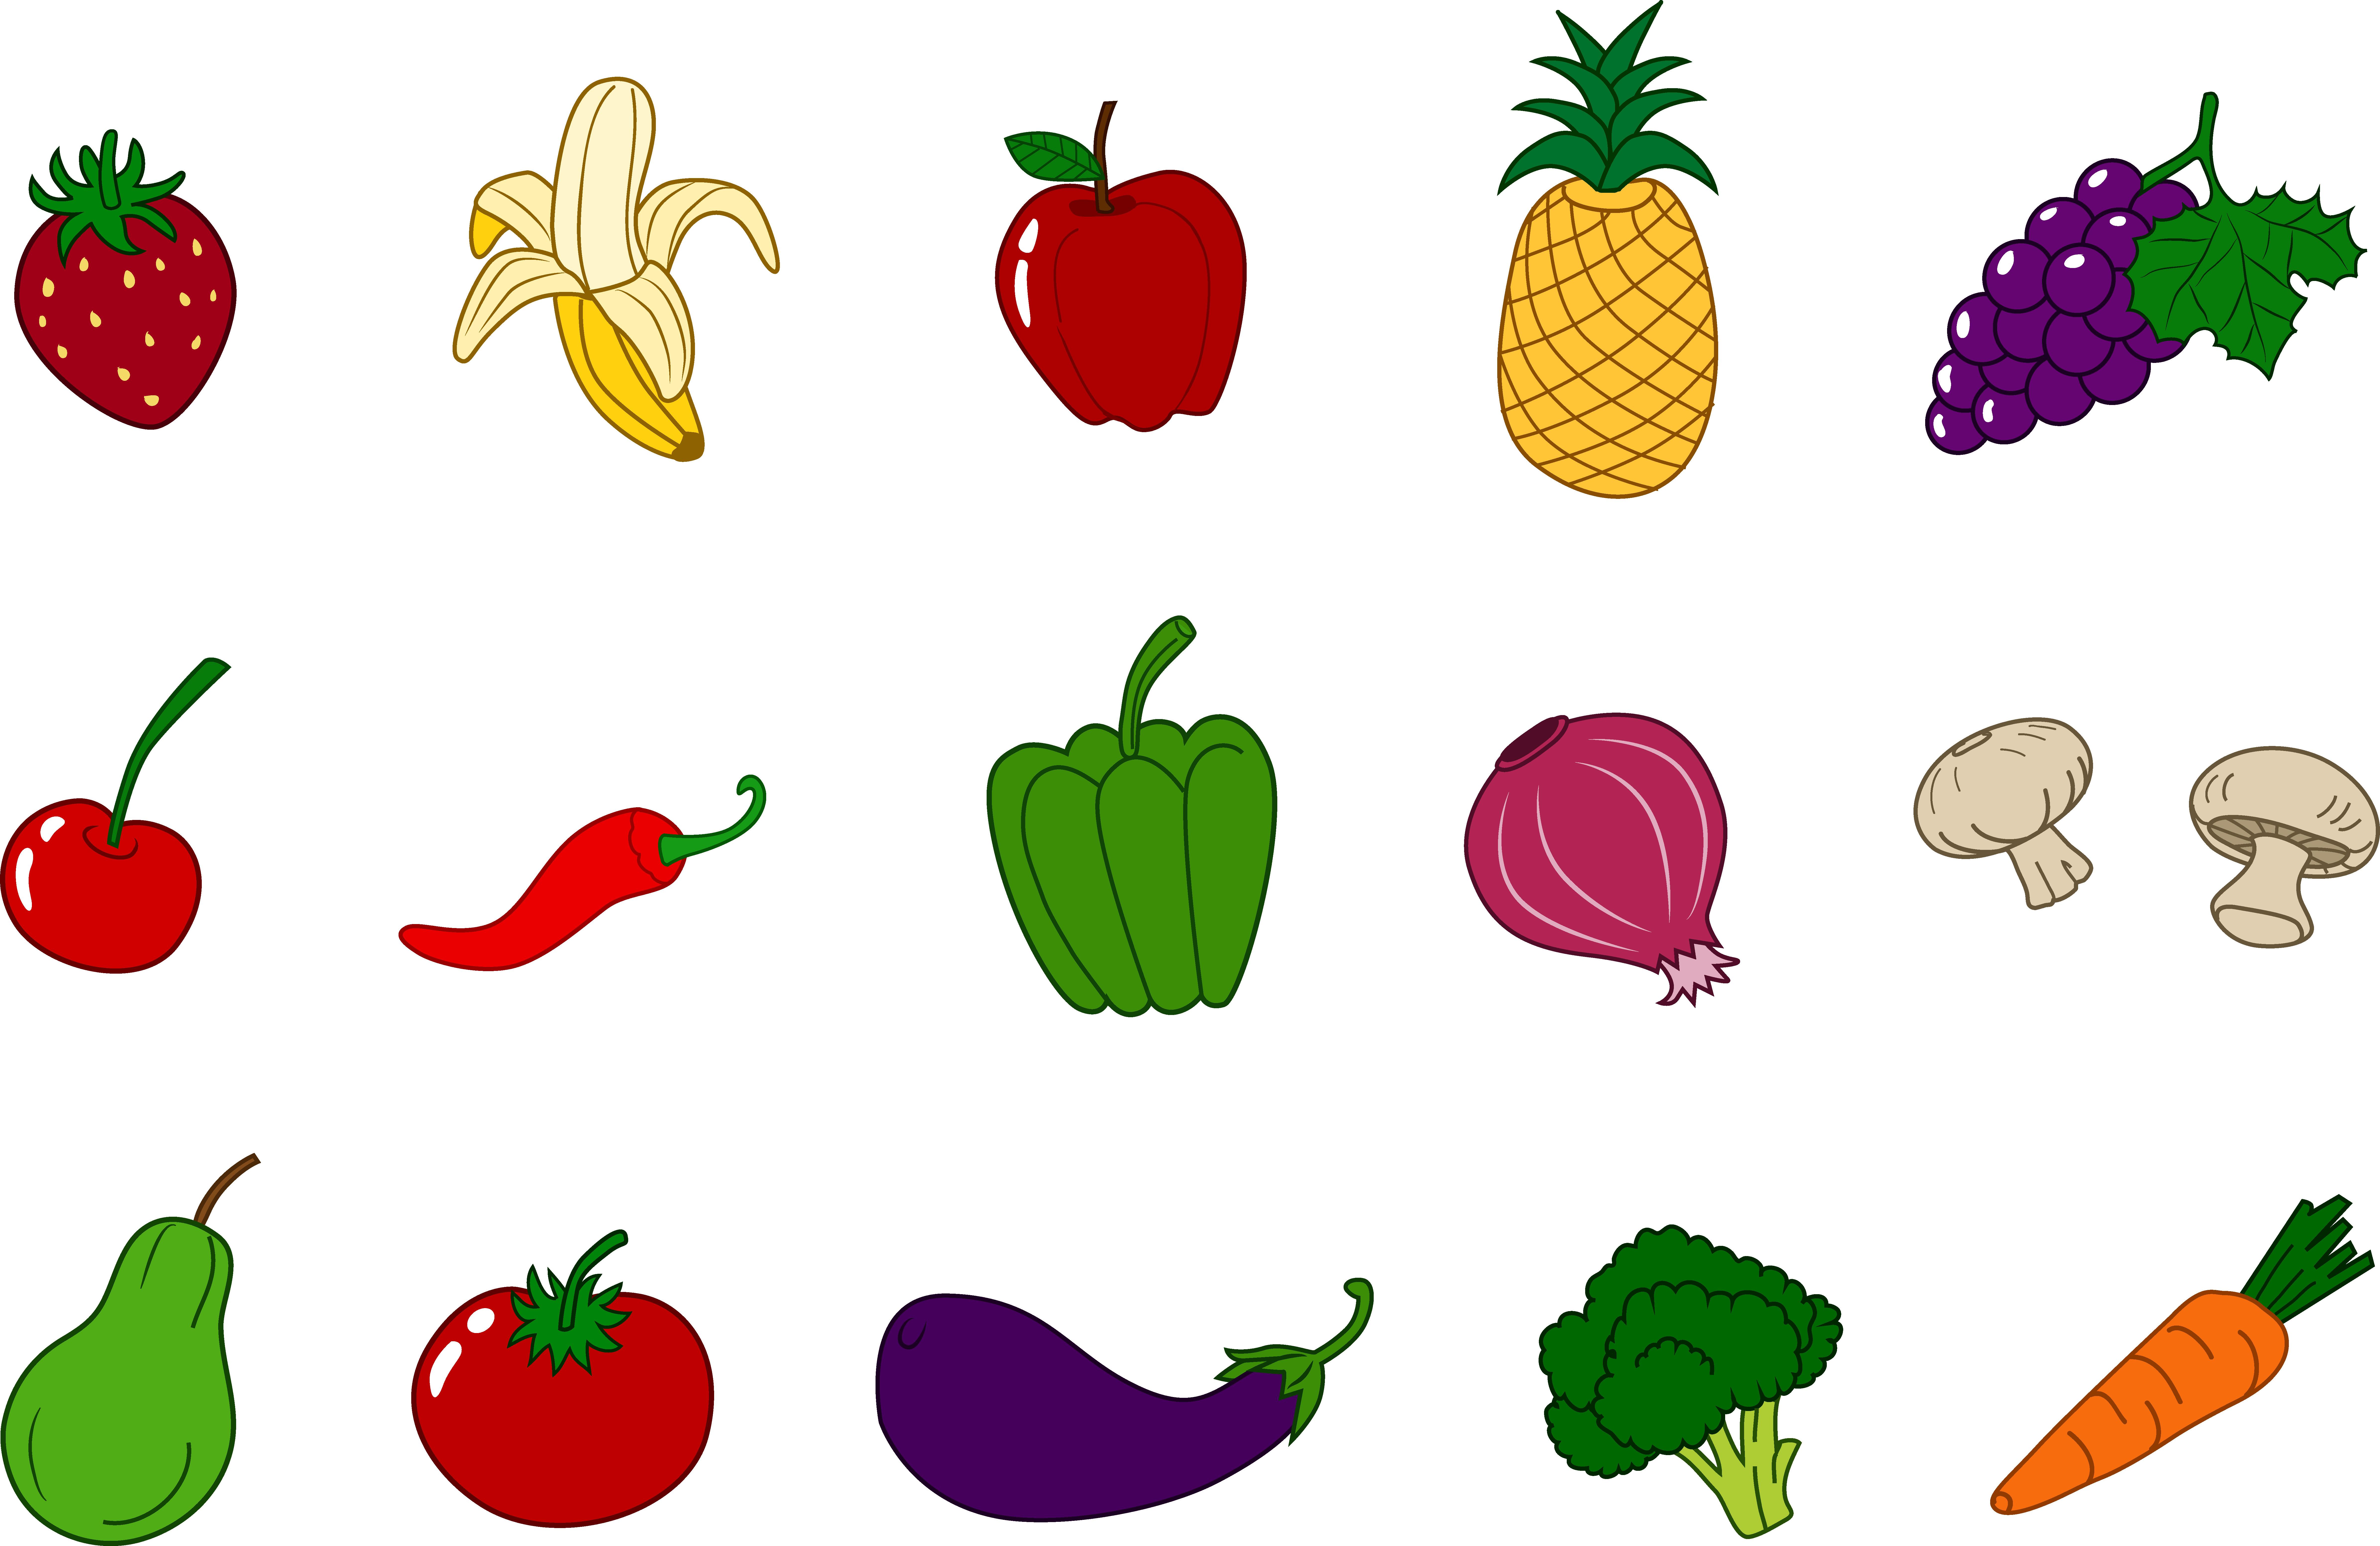 vegetable basket clipart at getdrawings com free for personal use rh getdrawings com vegetable clip art pictures vegetable clipart images